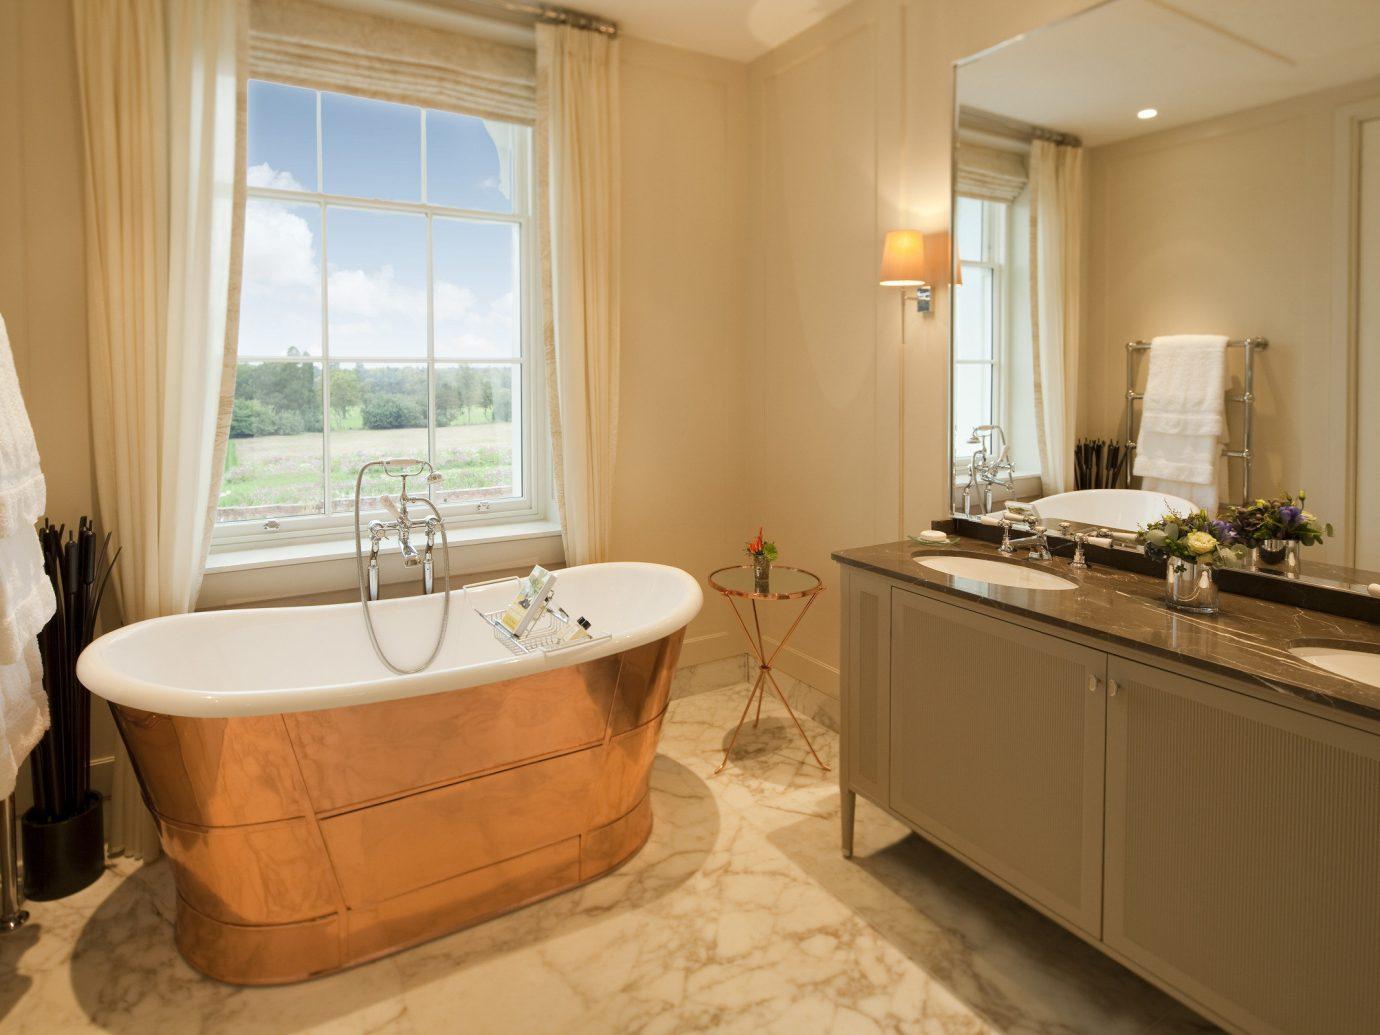 England europe London Luxury Travel Romantic Hotels Trip Ideas indoor window floor wall room bathroom interior design estate real estate home tub Suite flooring bathtub Bath furniture